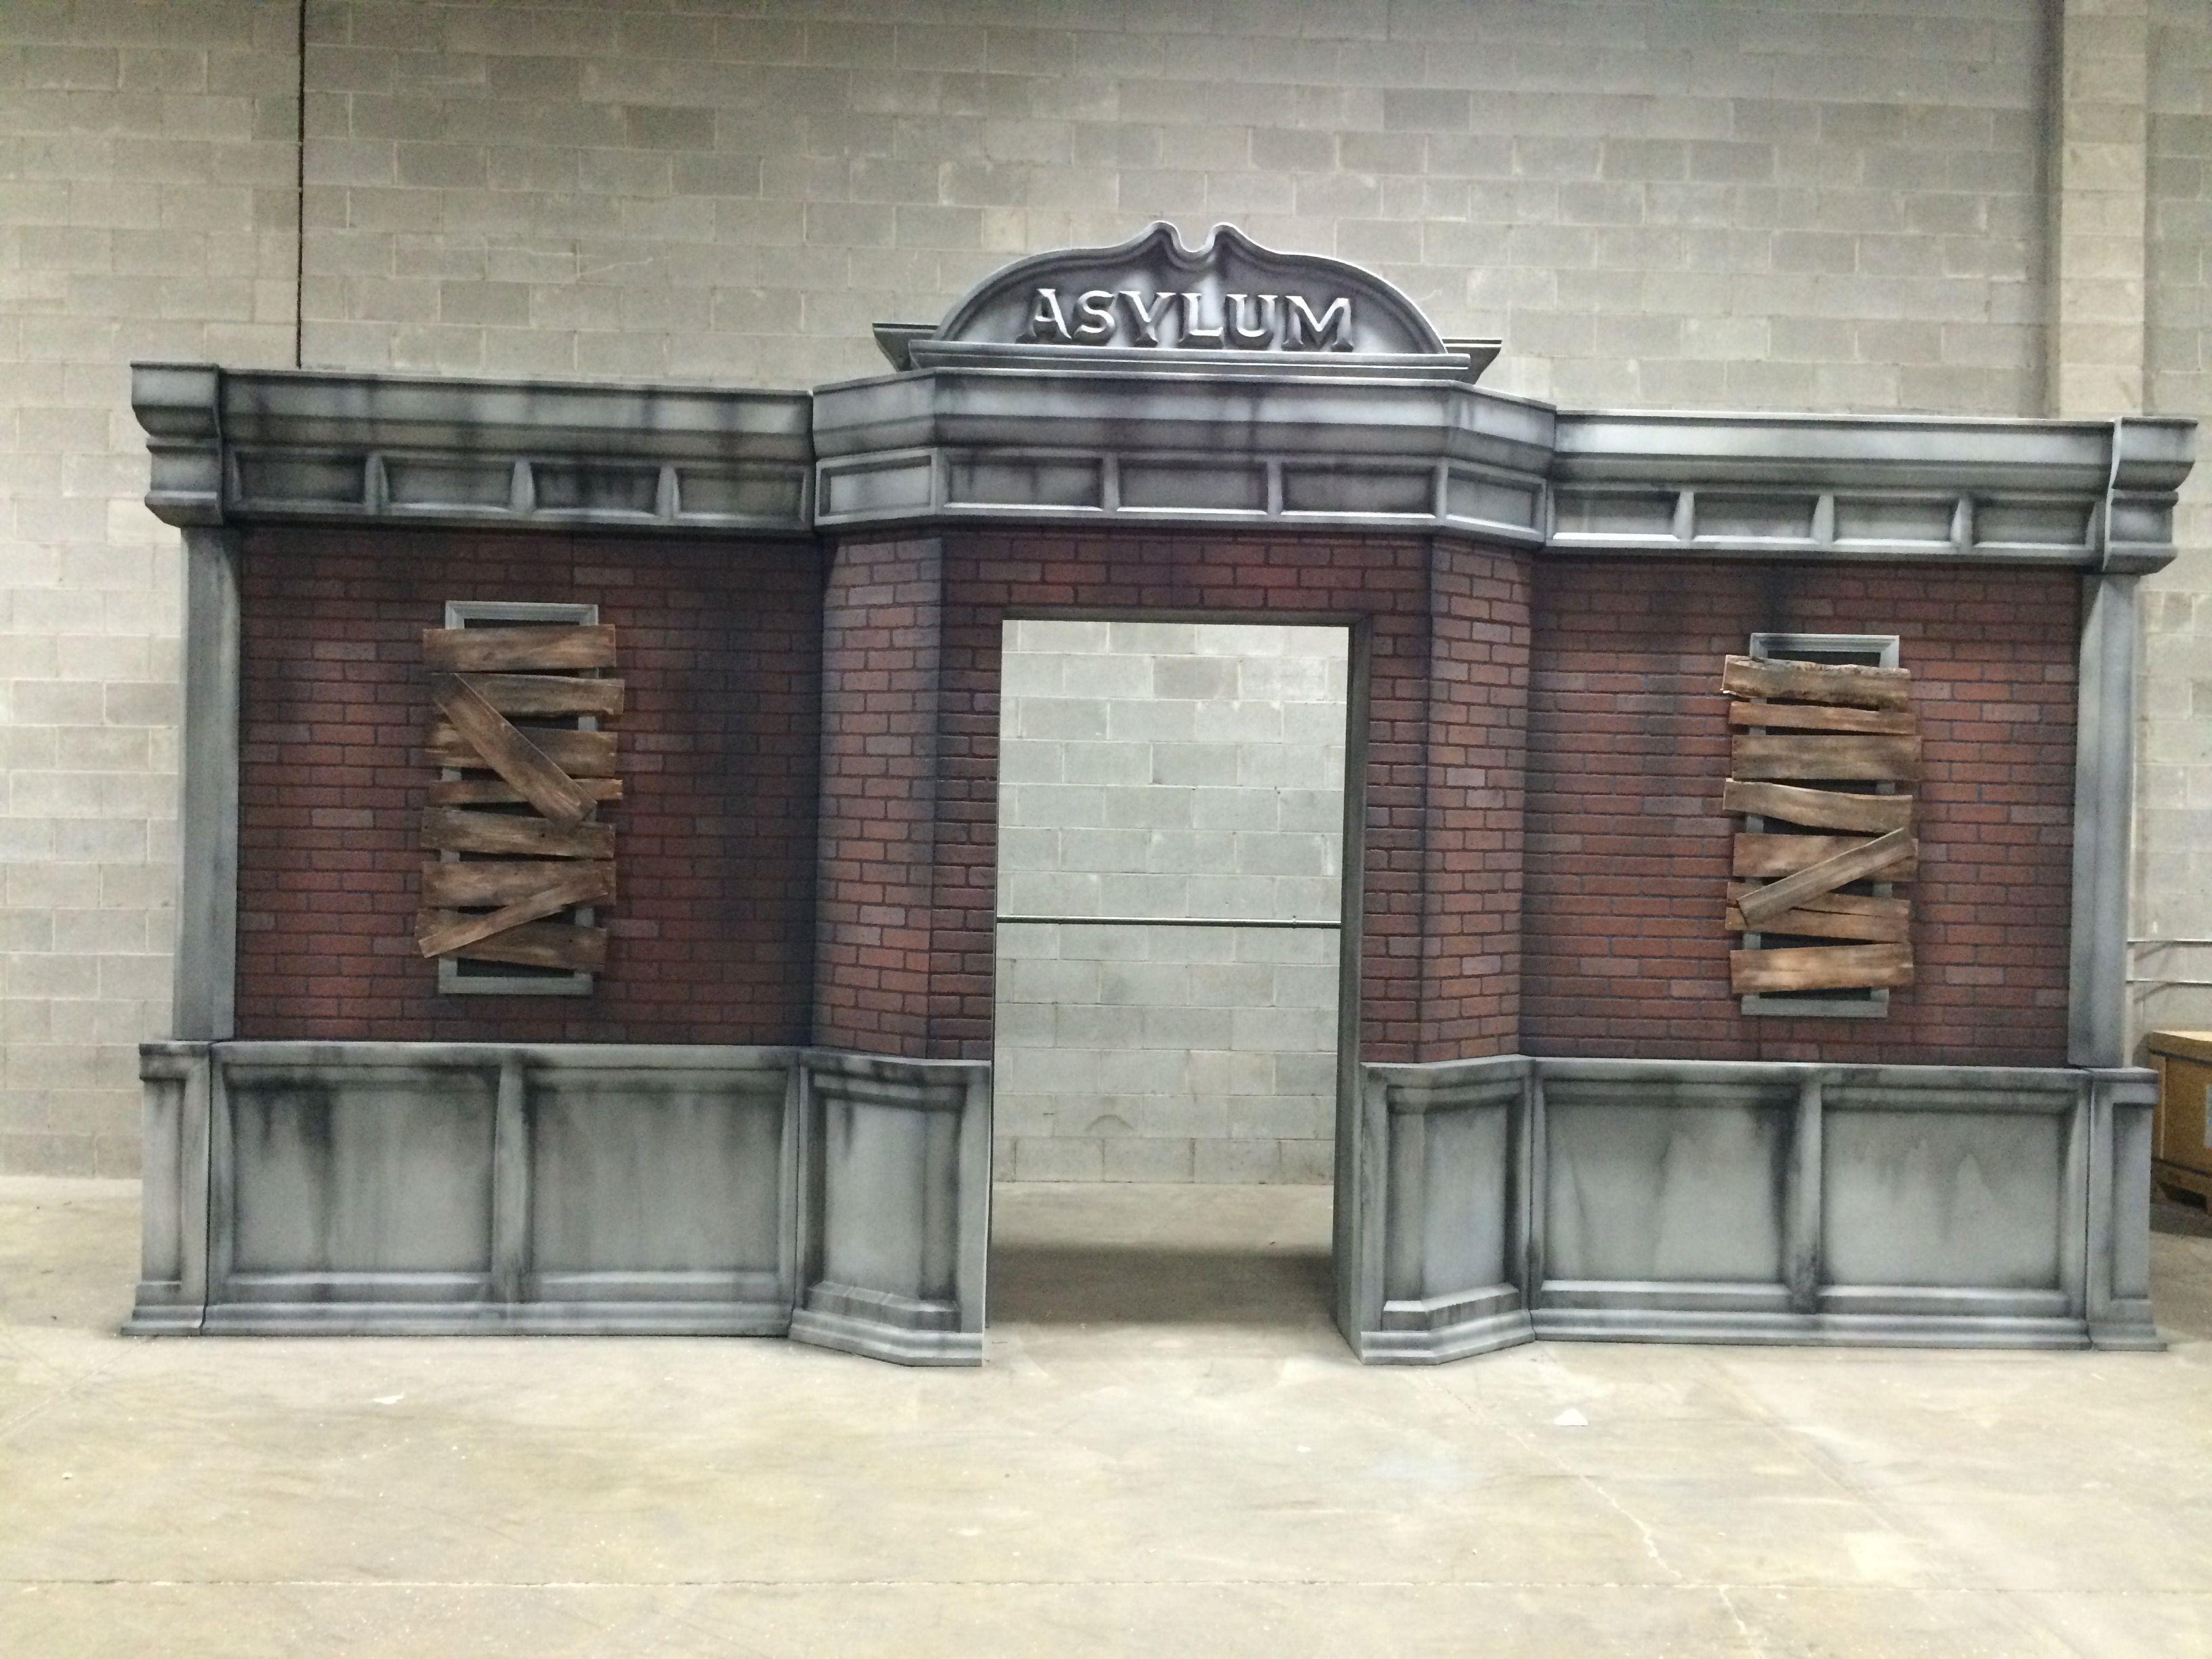 Asylum Haunted House Entry Facade Made By Legacy 3D Fx